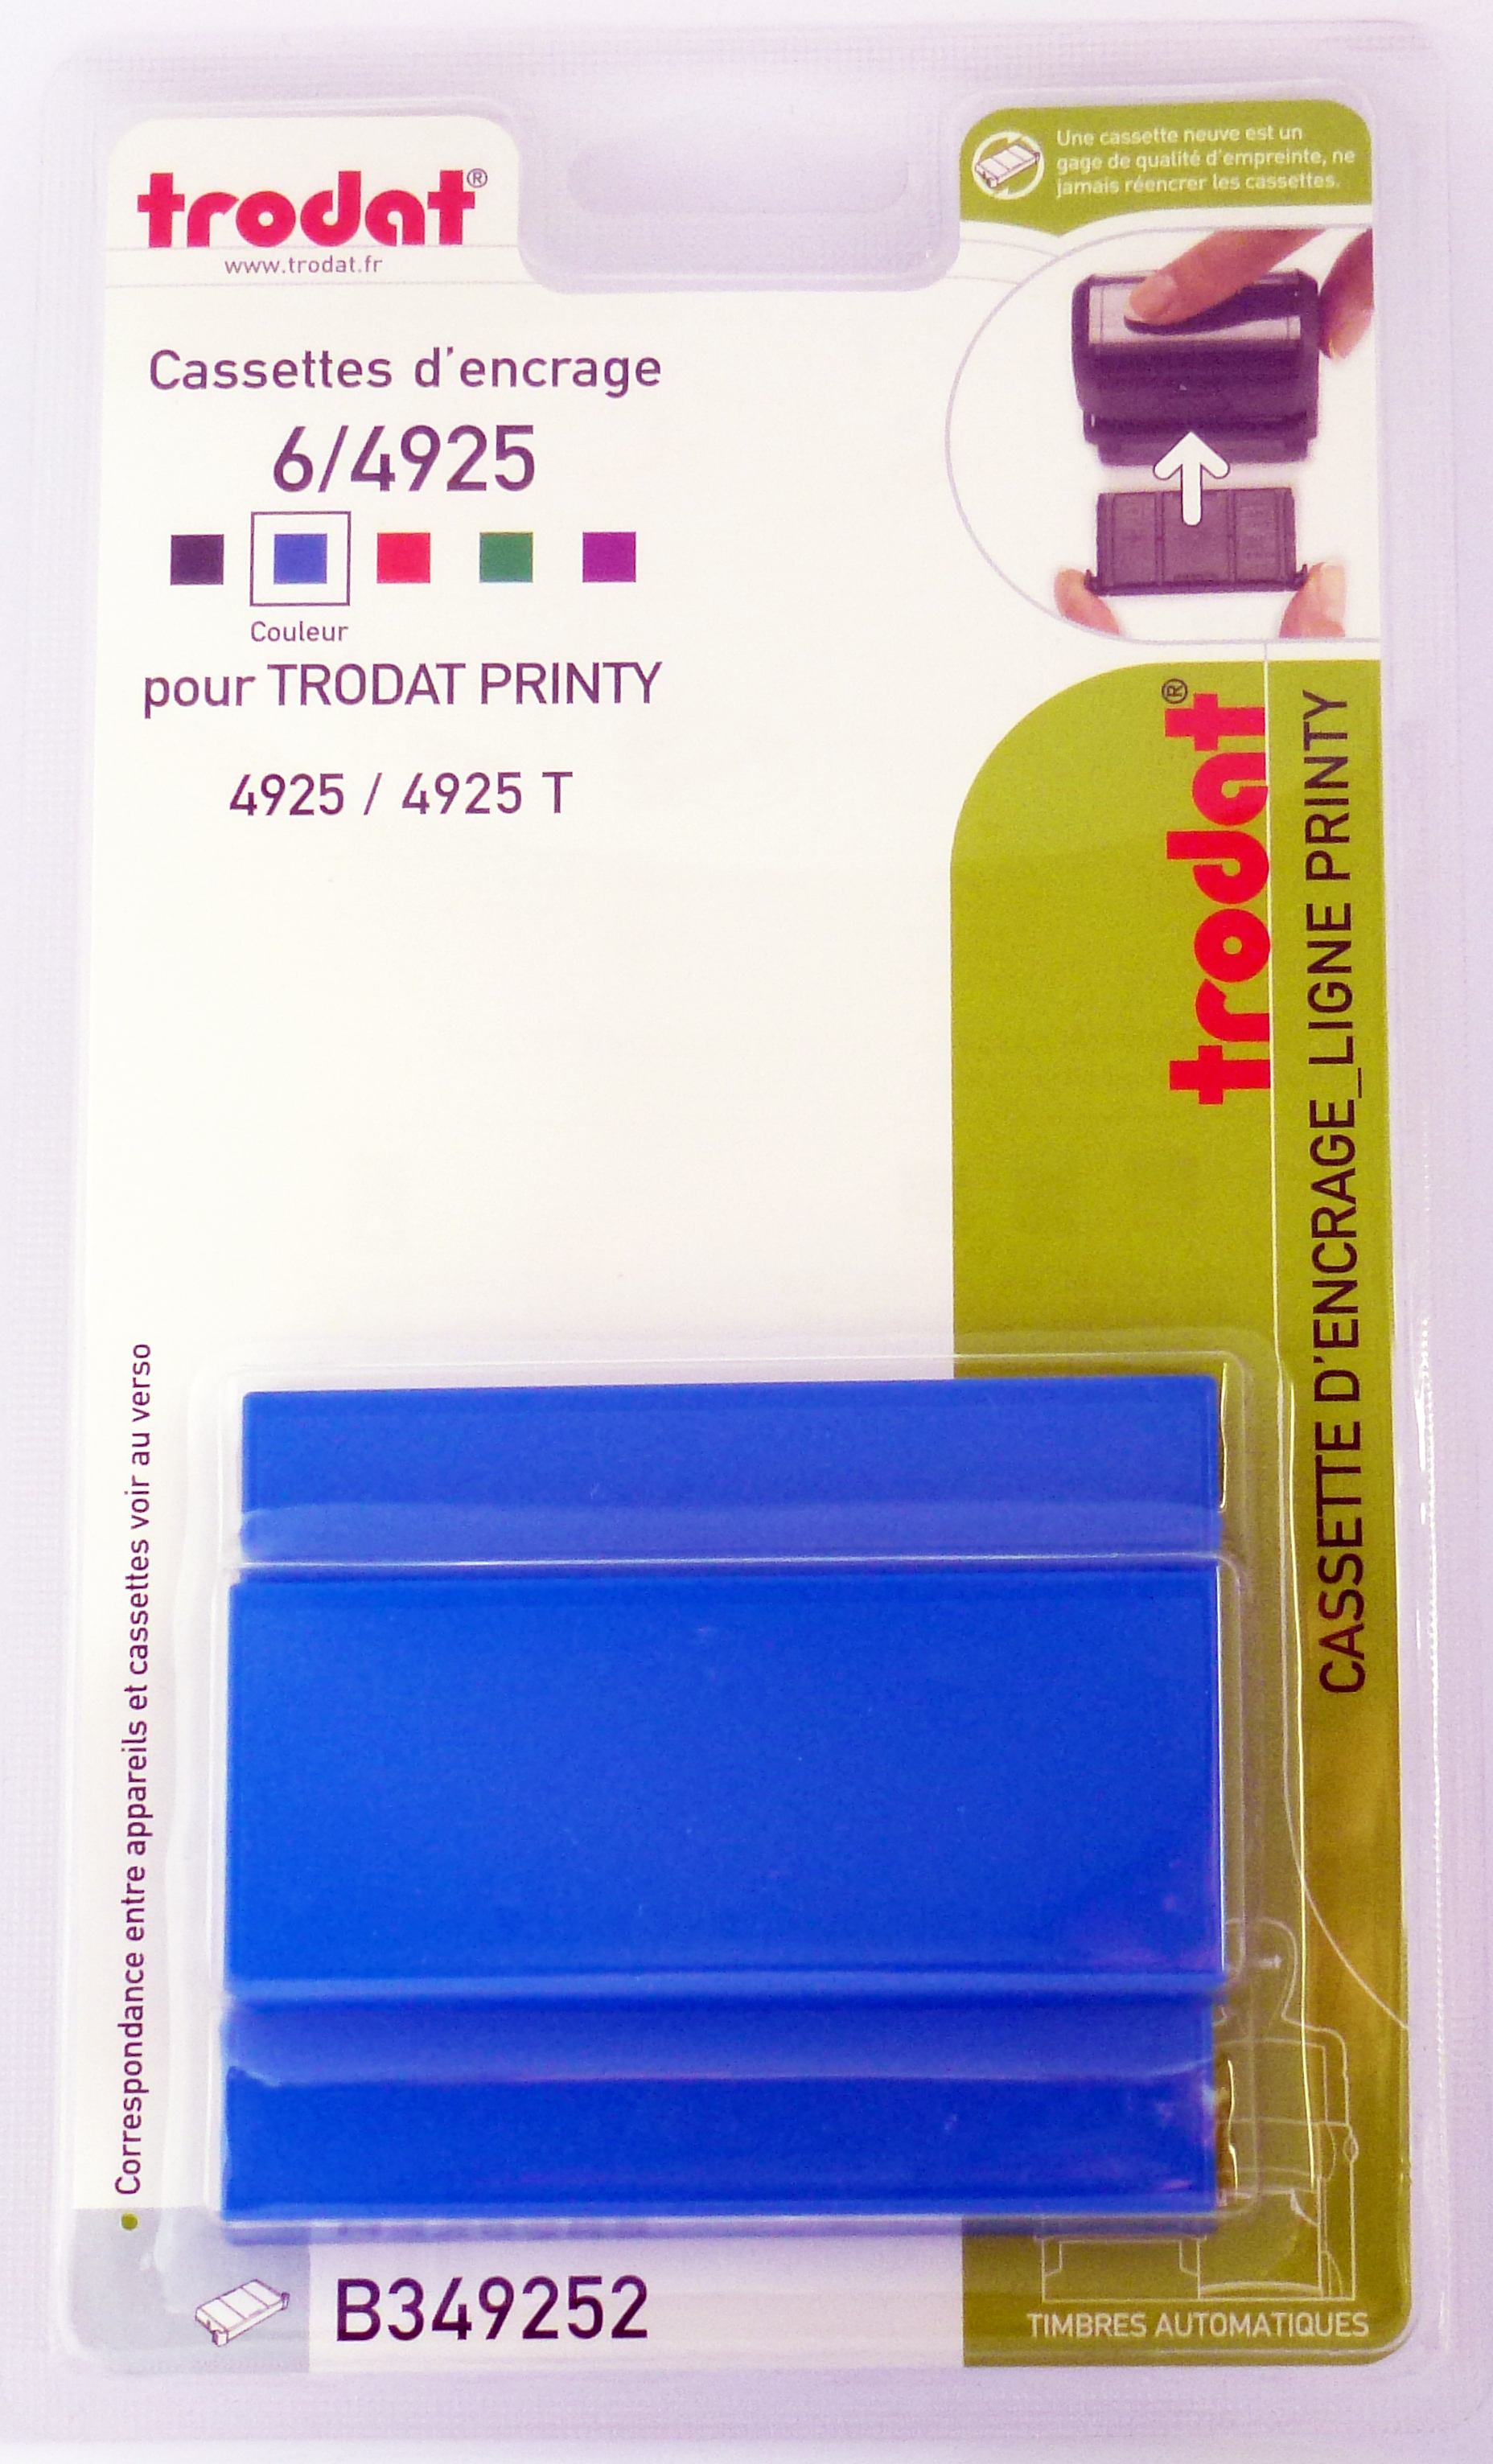 Trodat - 3 Encriers 6/4925 recharges pour tampon Printy 4925 - bleu